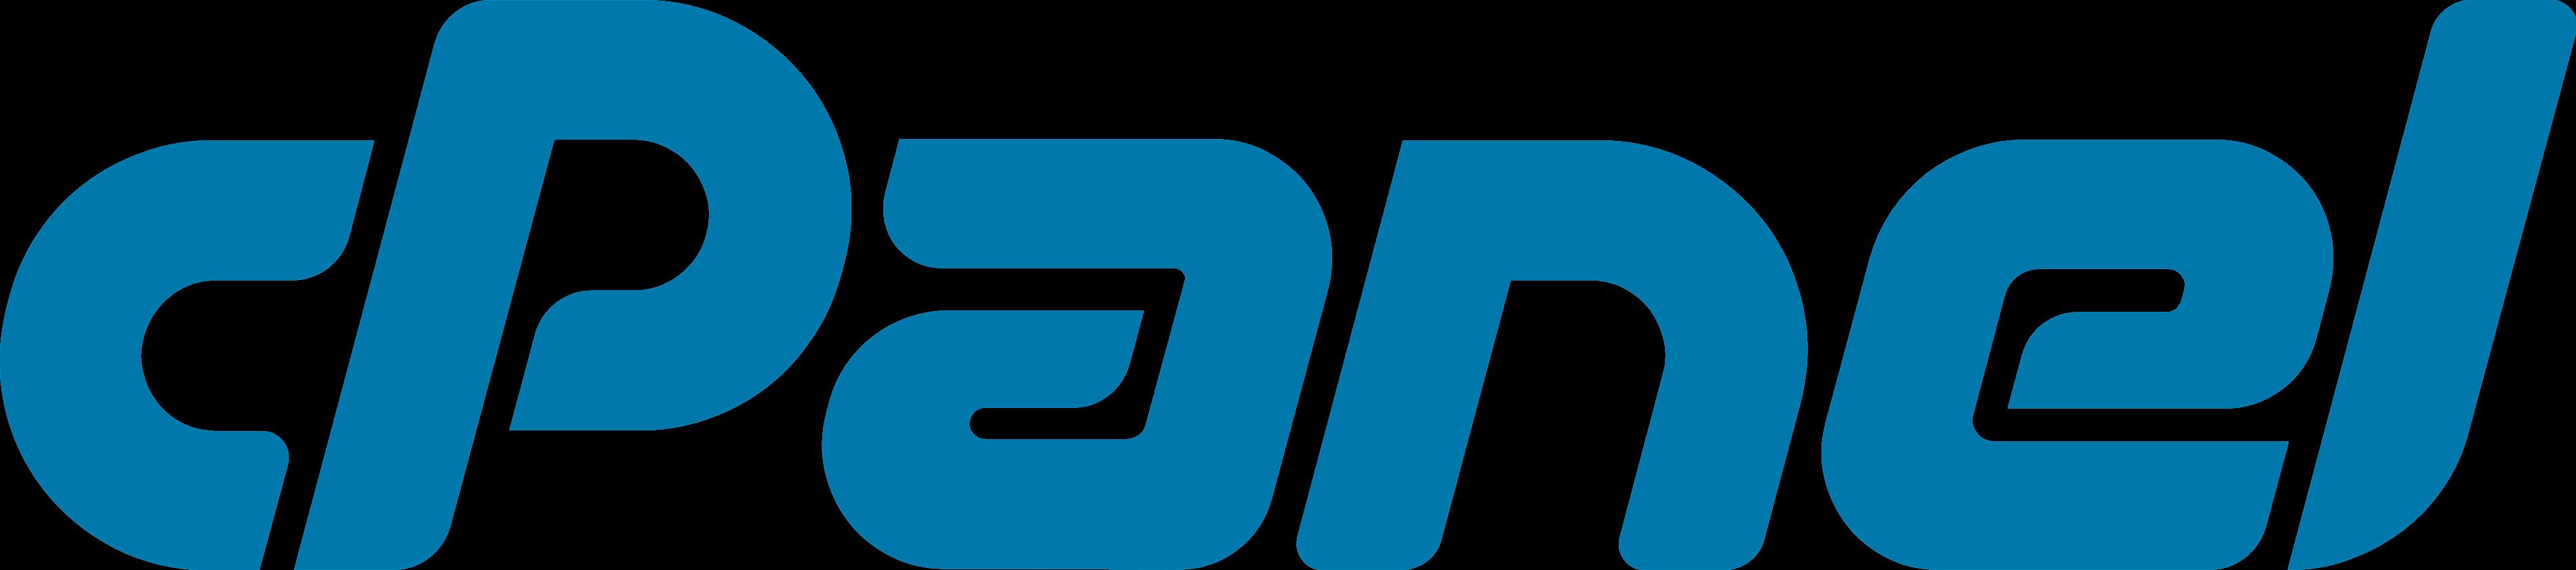 cPanel_logo_blue